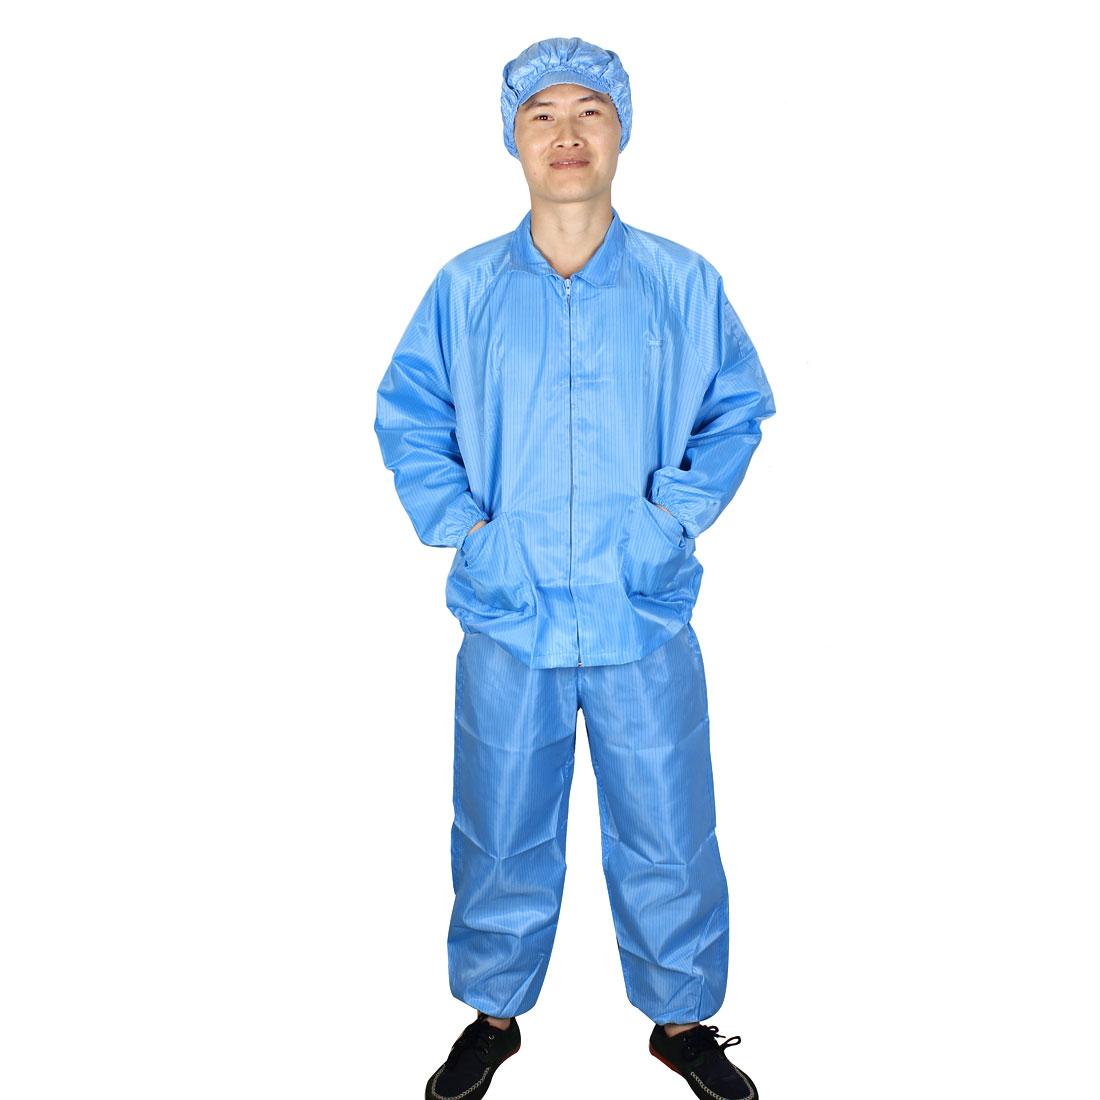 Unisex Blue Long Sleeve Zipper Stripes Pattern Anti Static Overalls Suit Uniform XXL